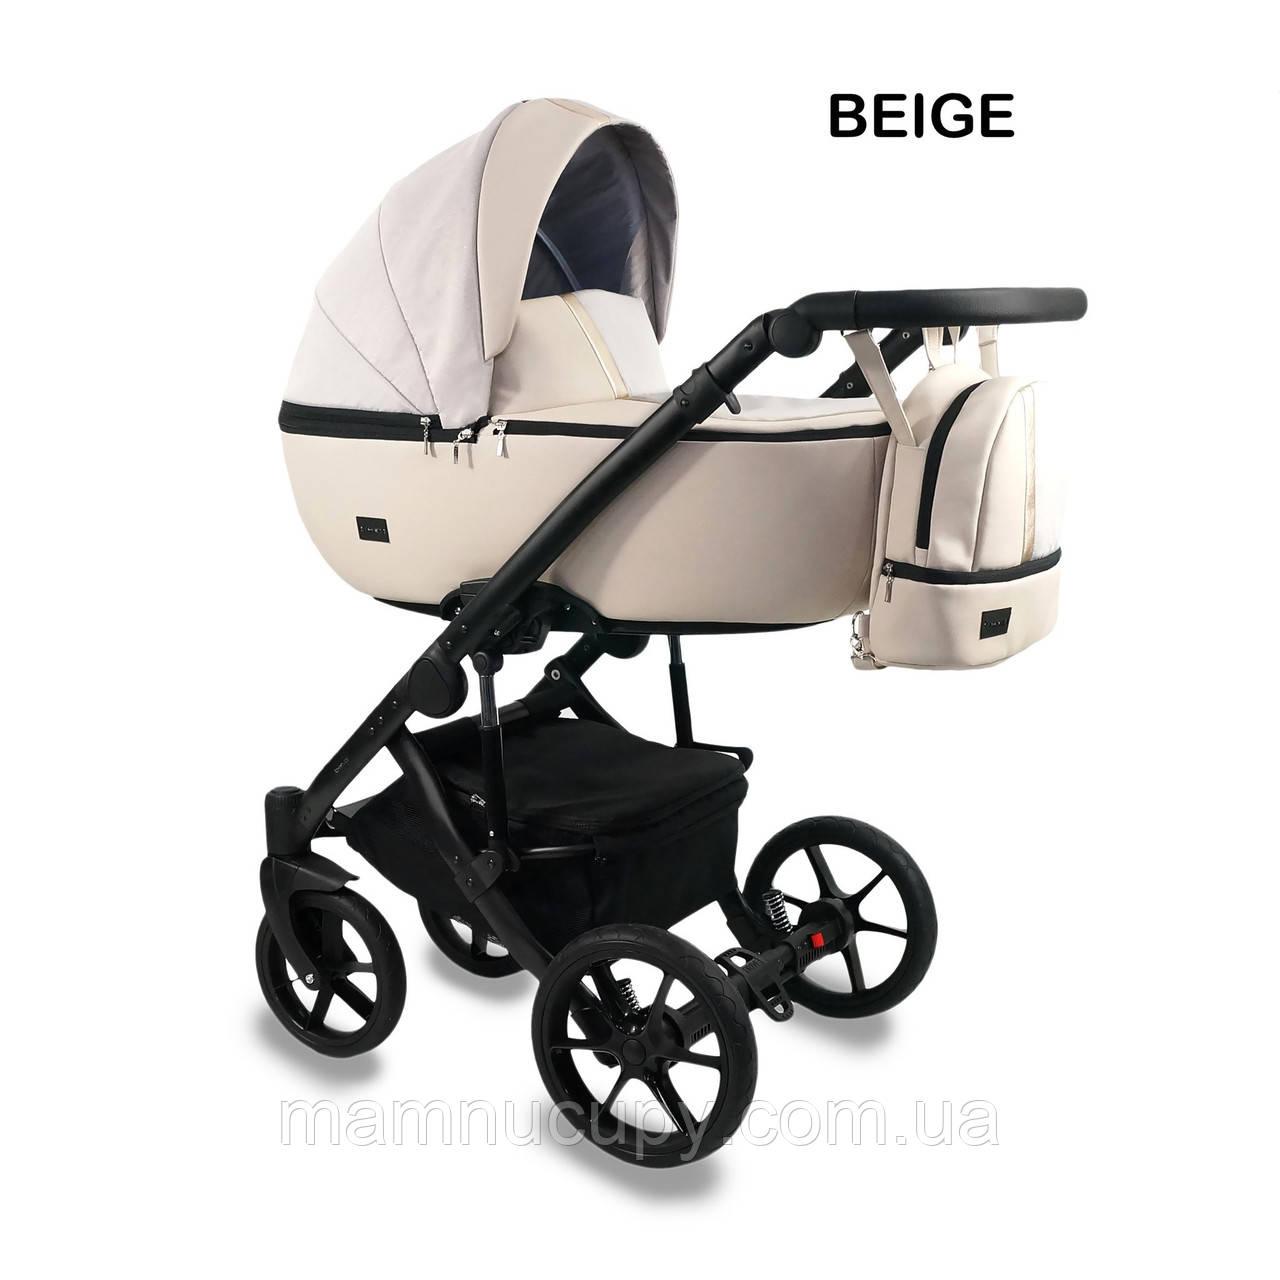 Дитяча універсальна коляска 2 в 1 Bexa Air Beige